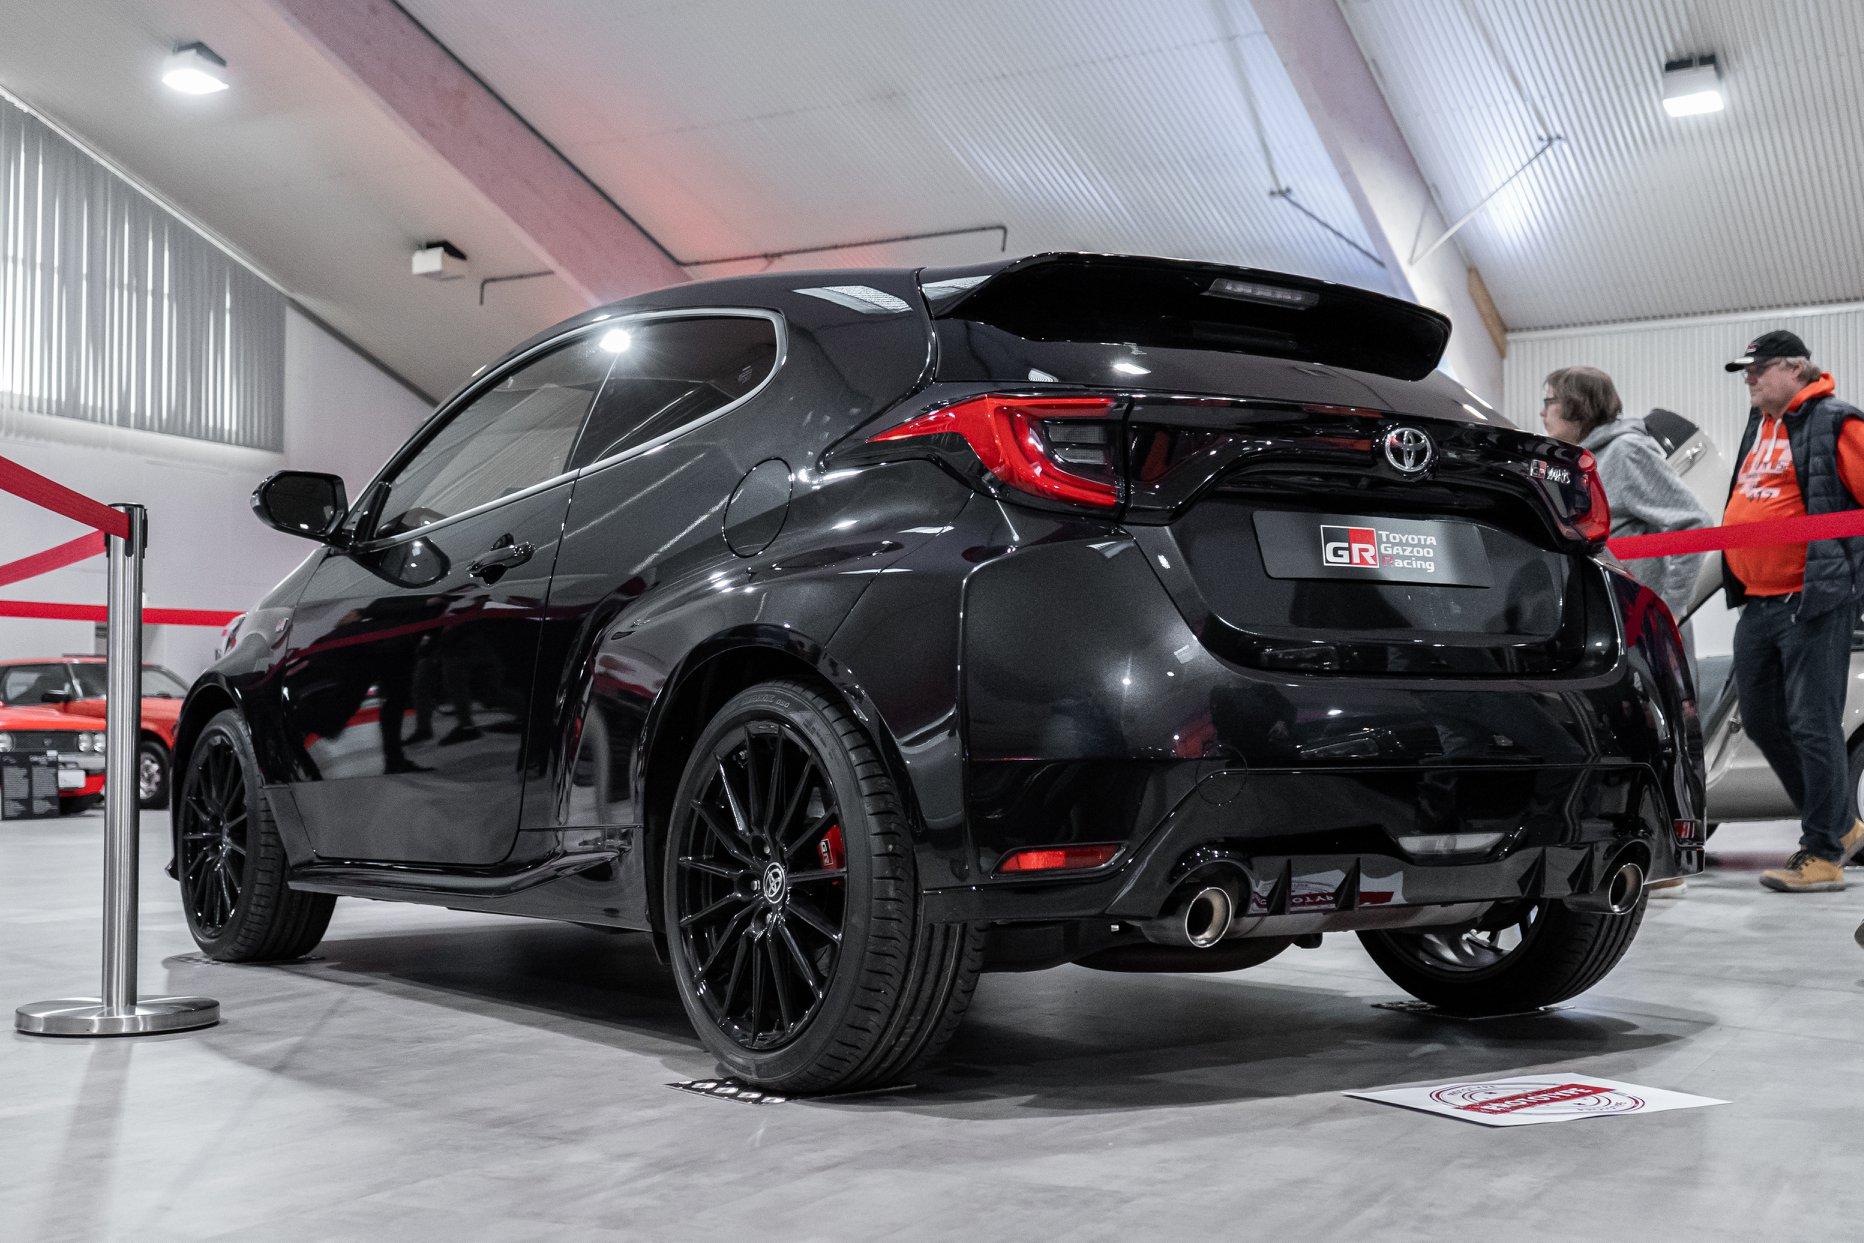 Bmlack_Toyota_GR_Yaris_0006